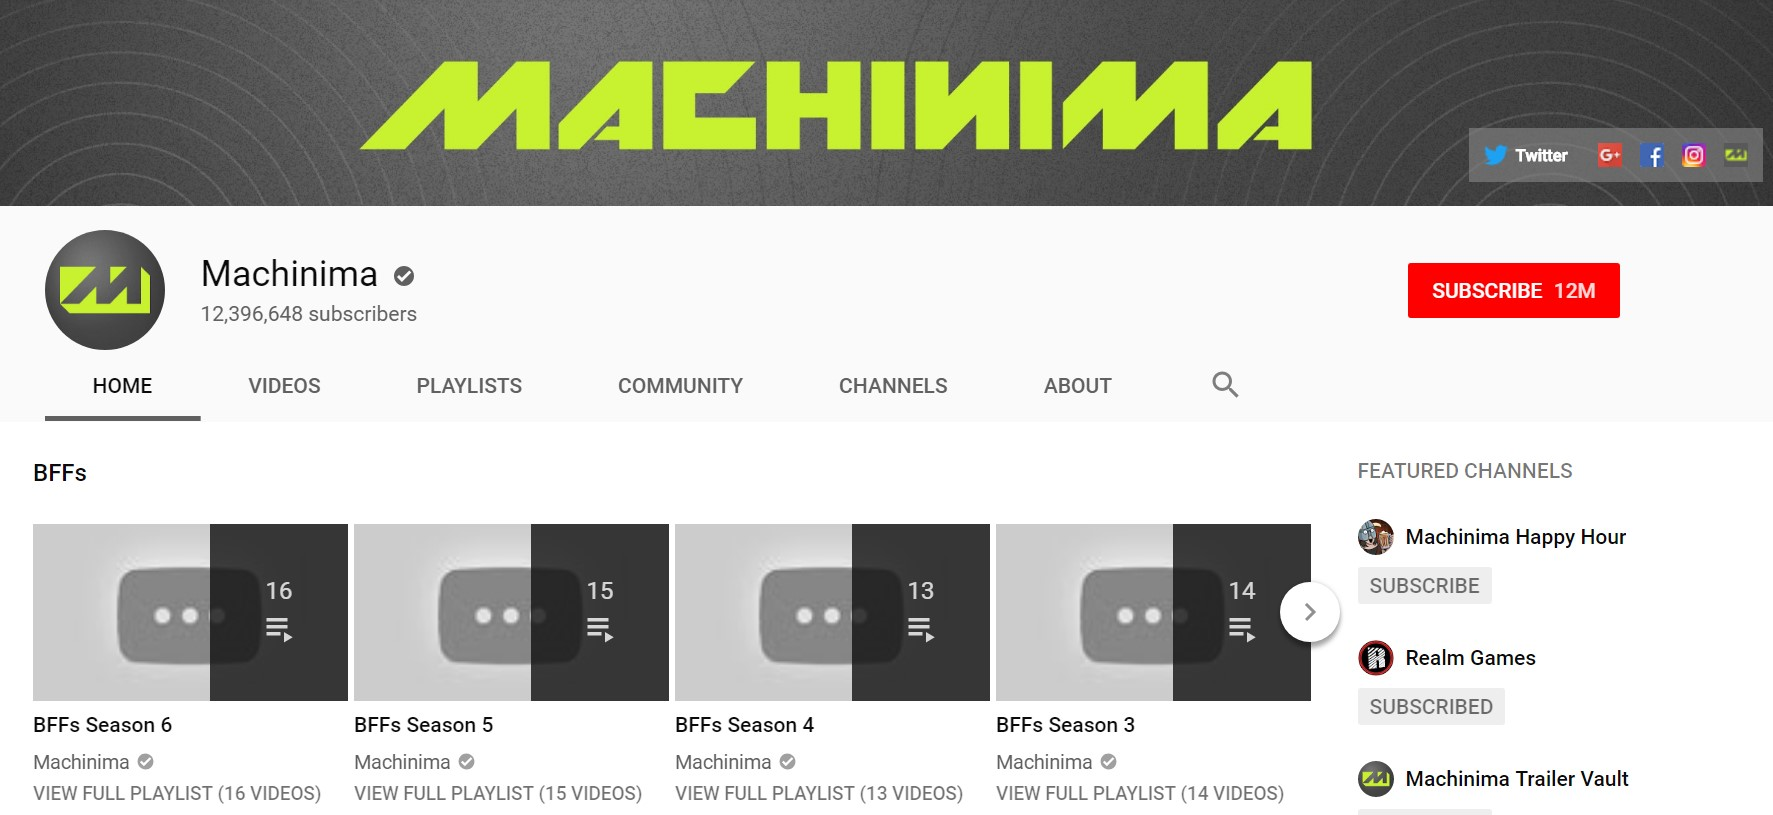 Machinima YouTube Gets Axed | Cosmic Book News